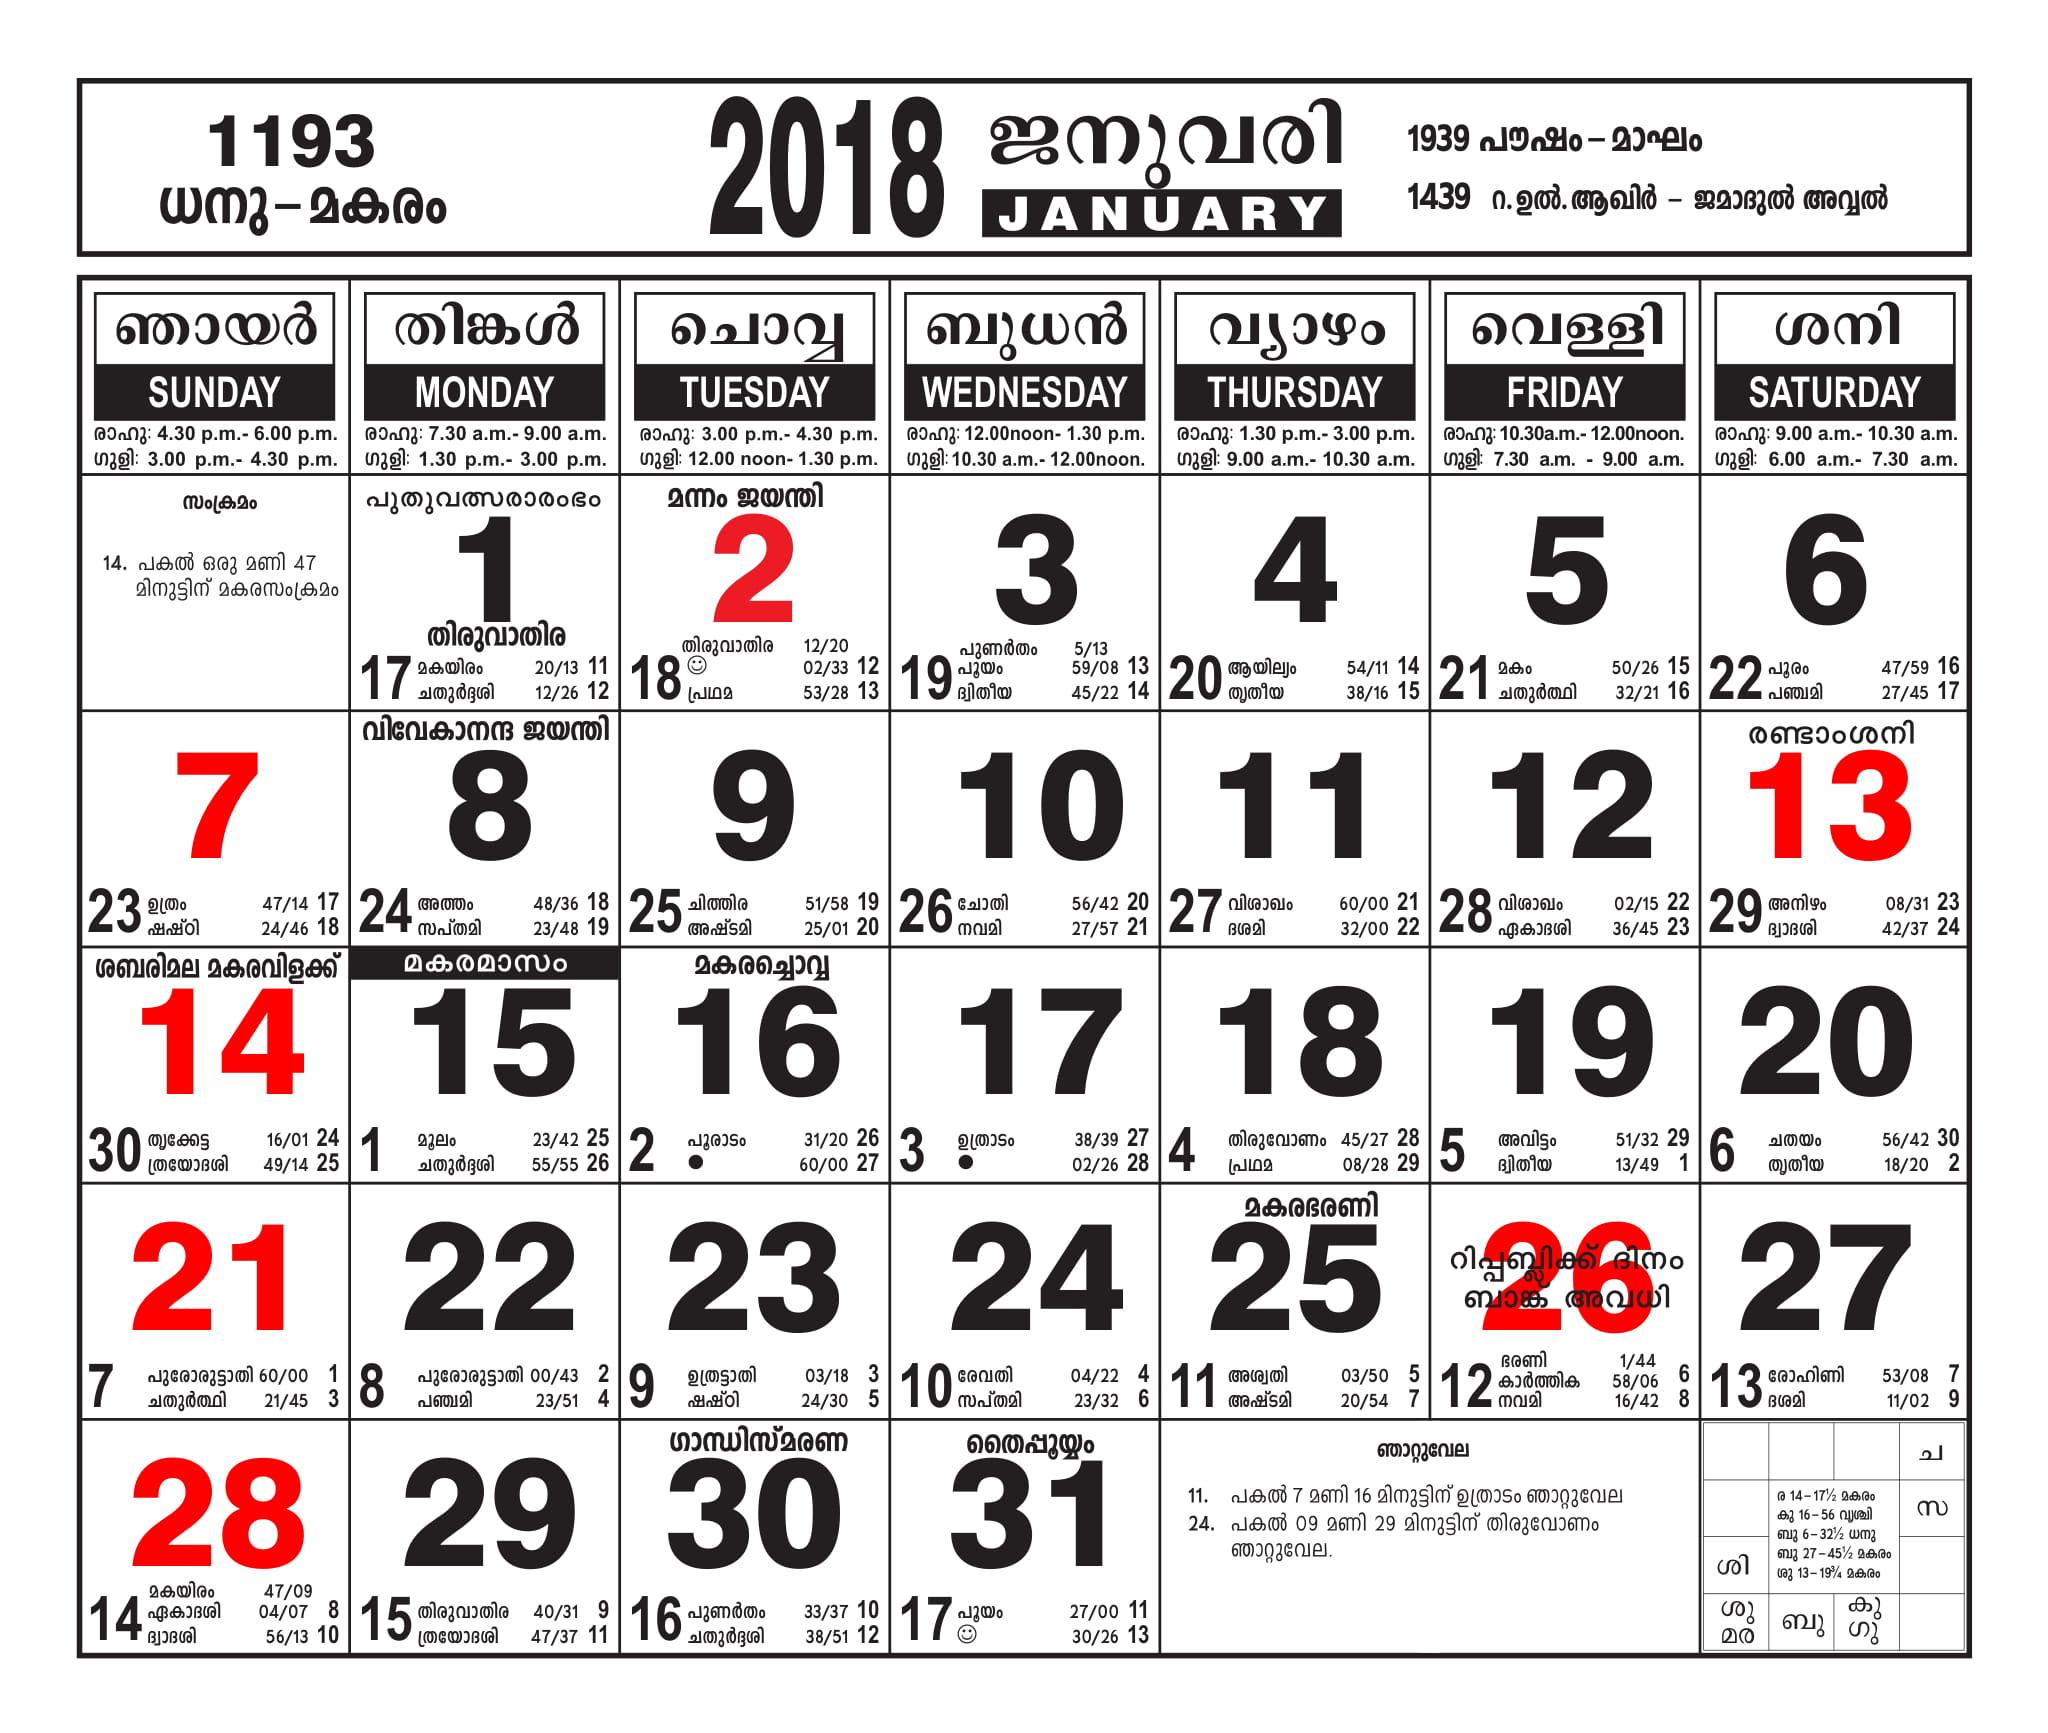 Malayalam Calendar January 2018 – Malayalamcalendars